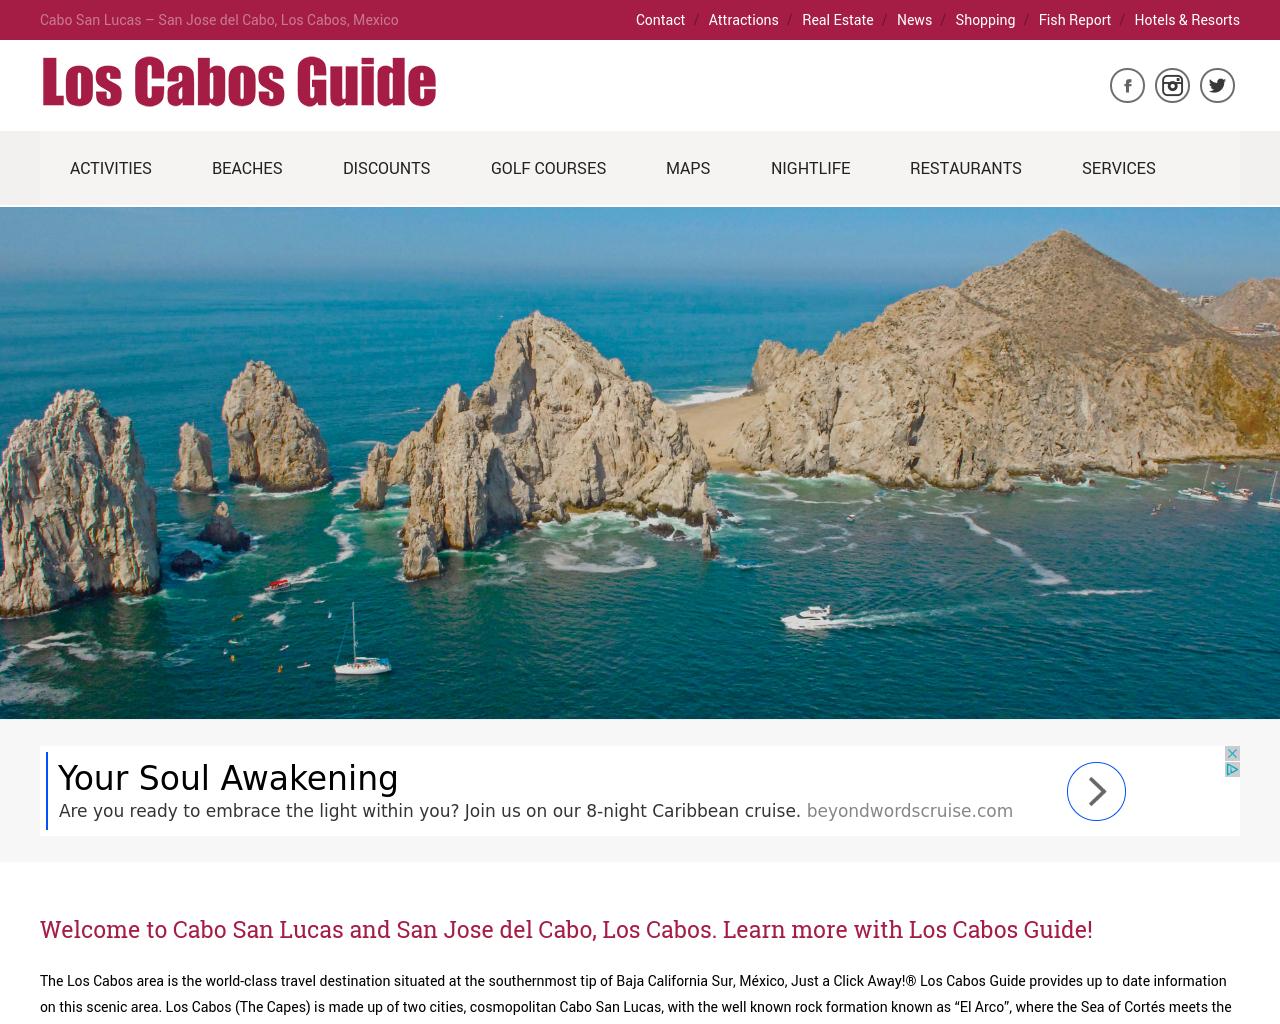 Los-Cabos-Guide-Advertising-Reviews-Pricing